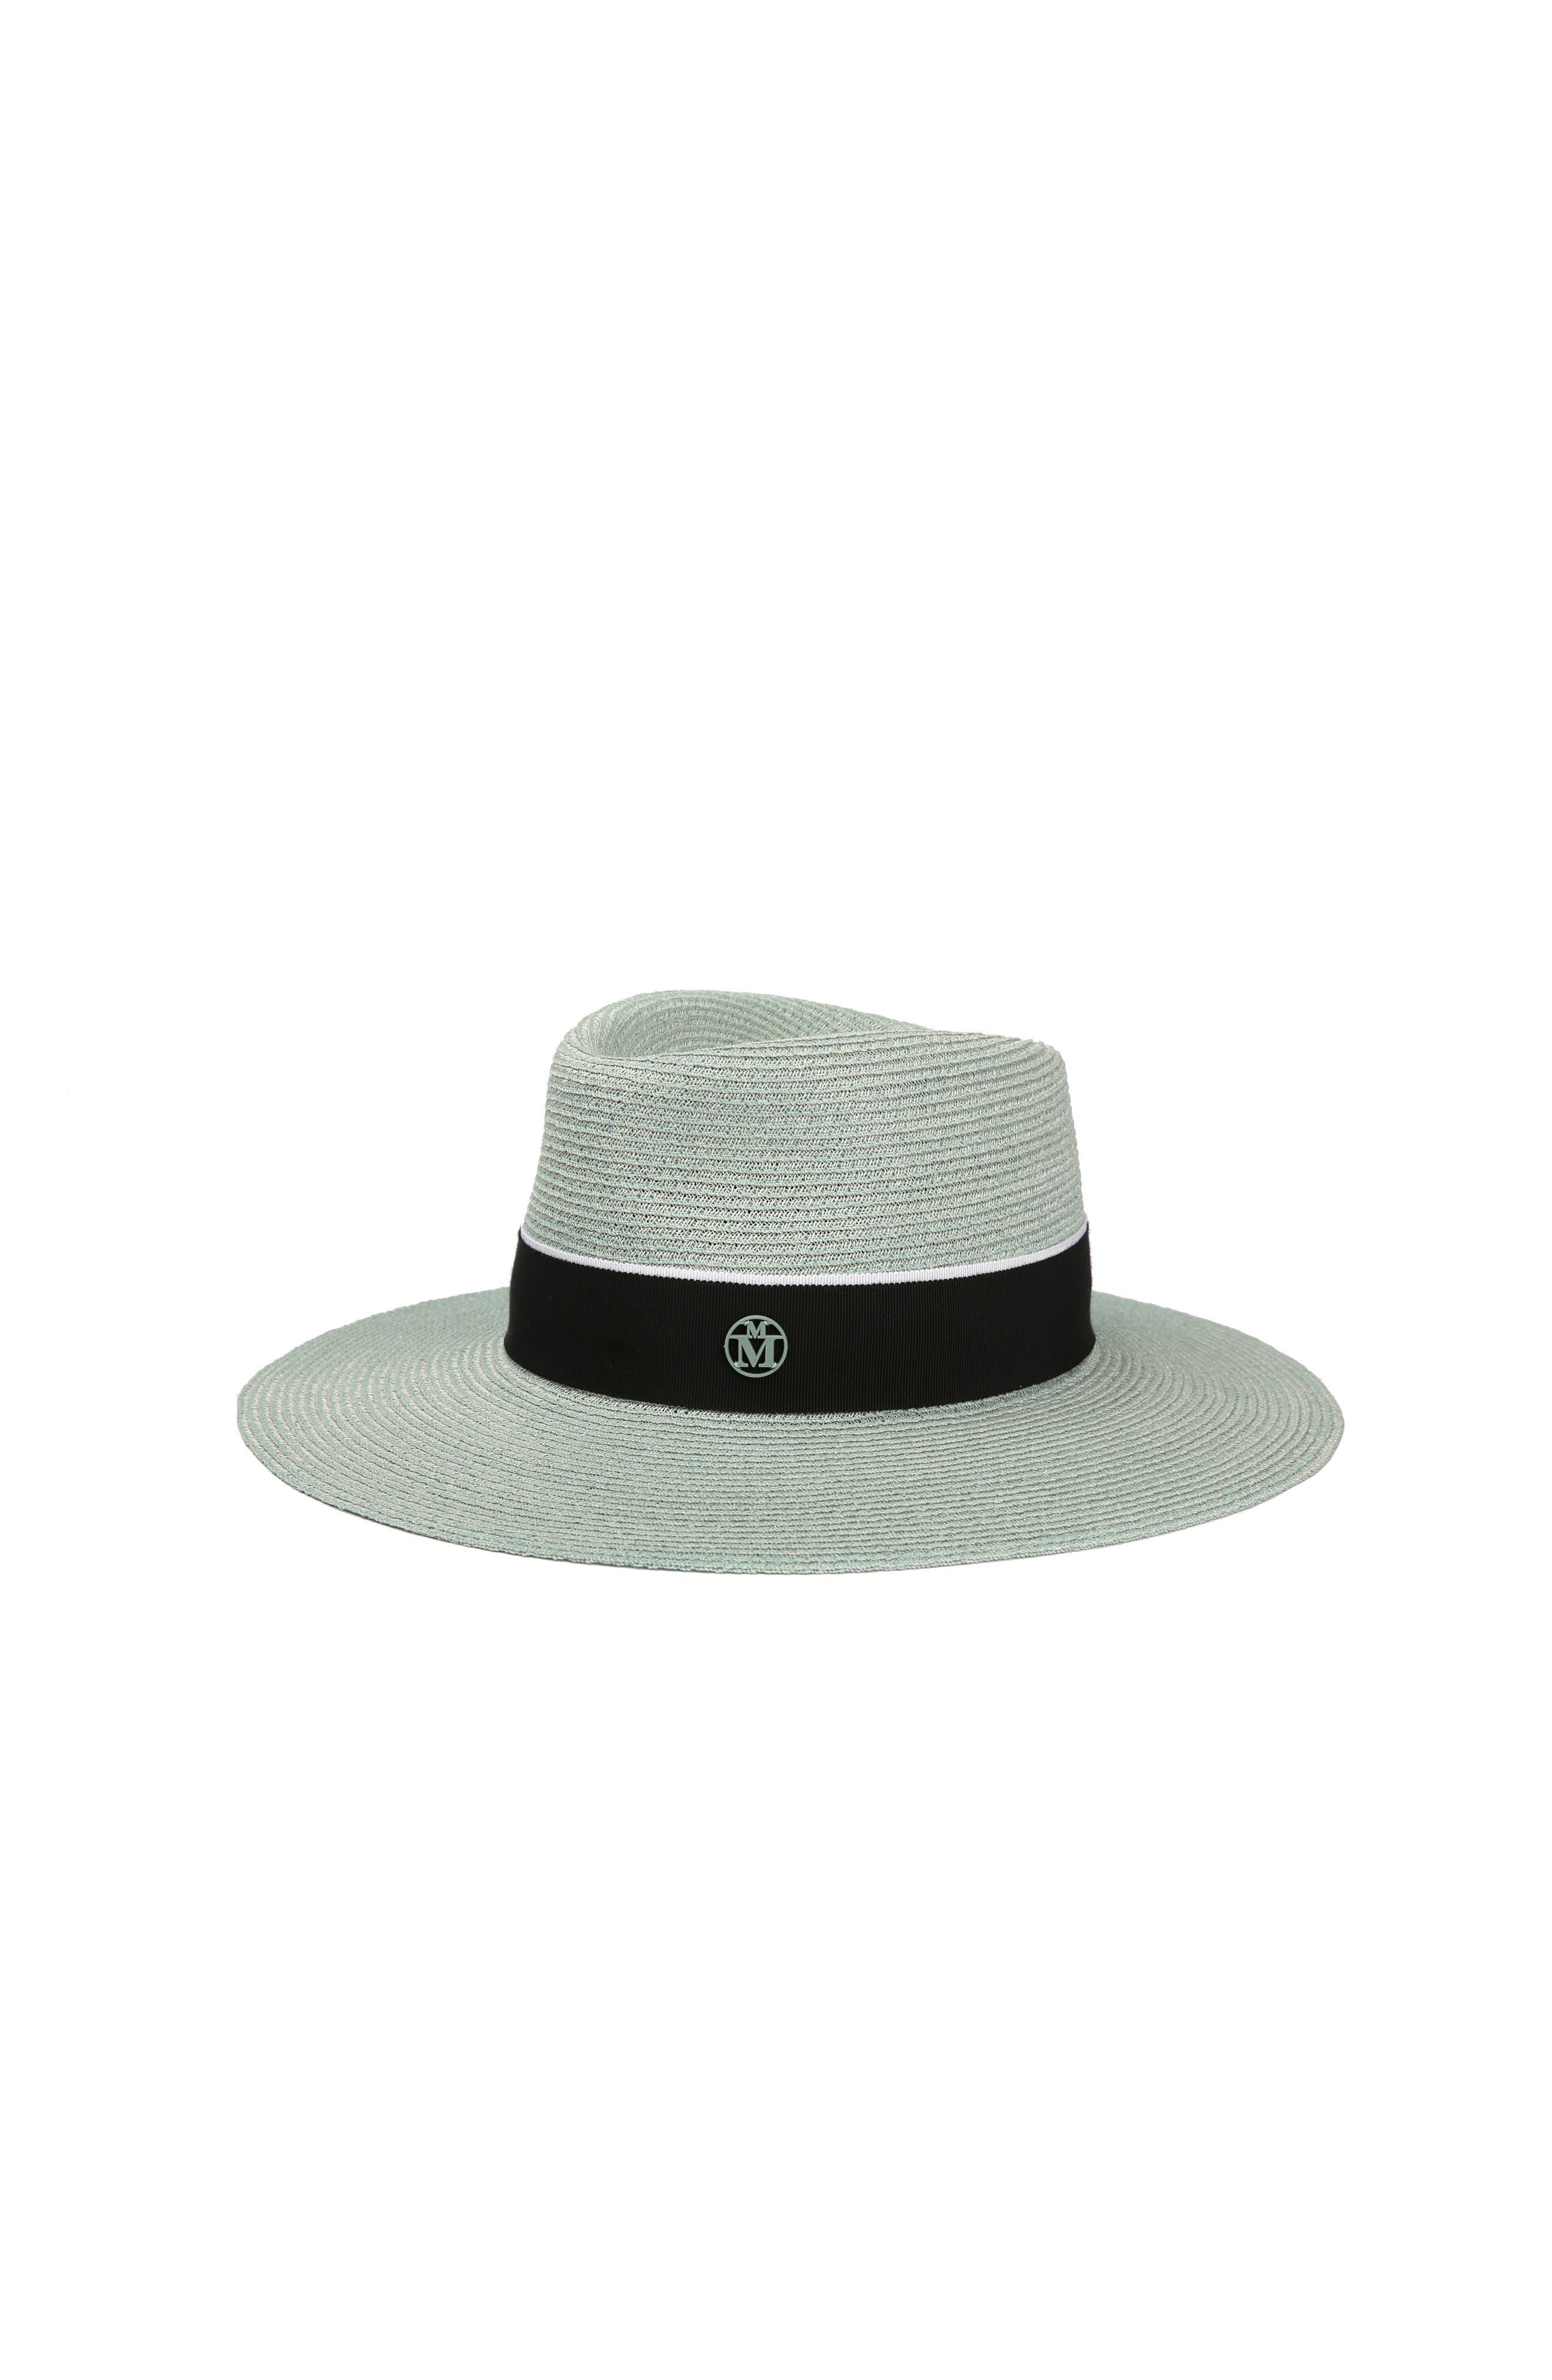 Charles Straw Hat,                             Main thumbnail 1, color,                             Mint